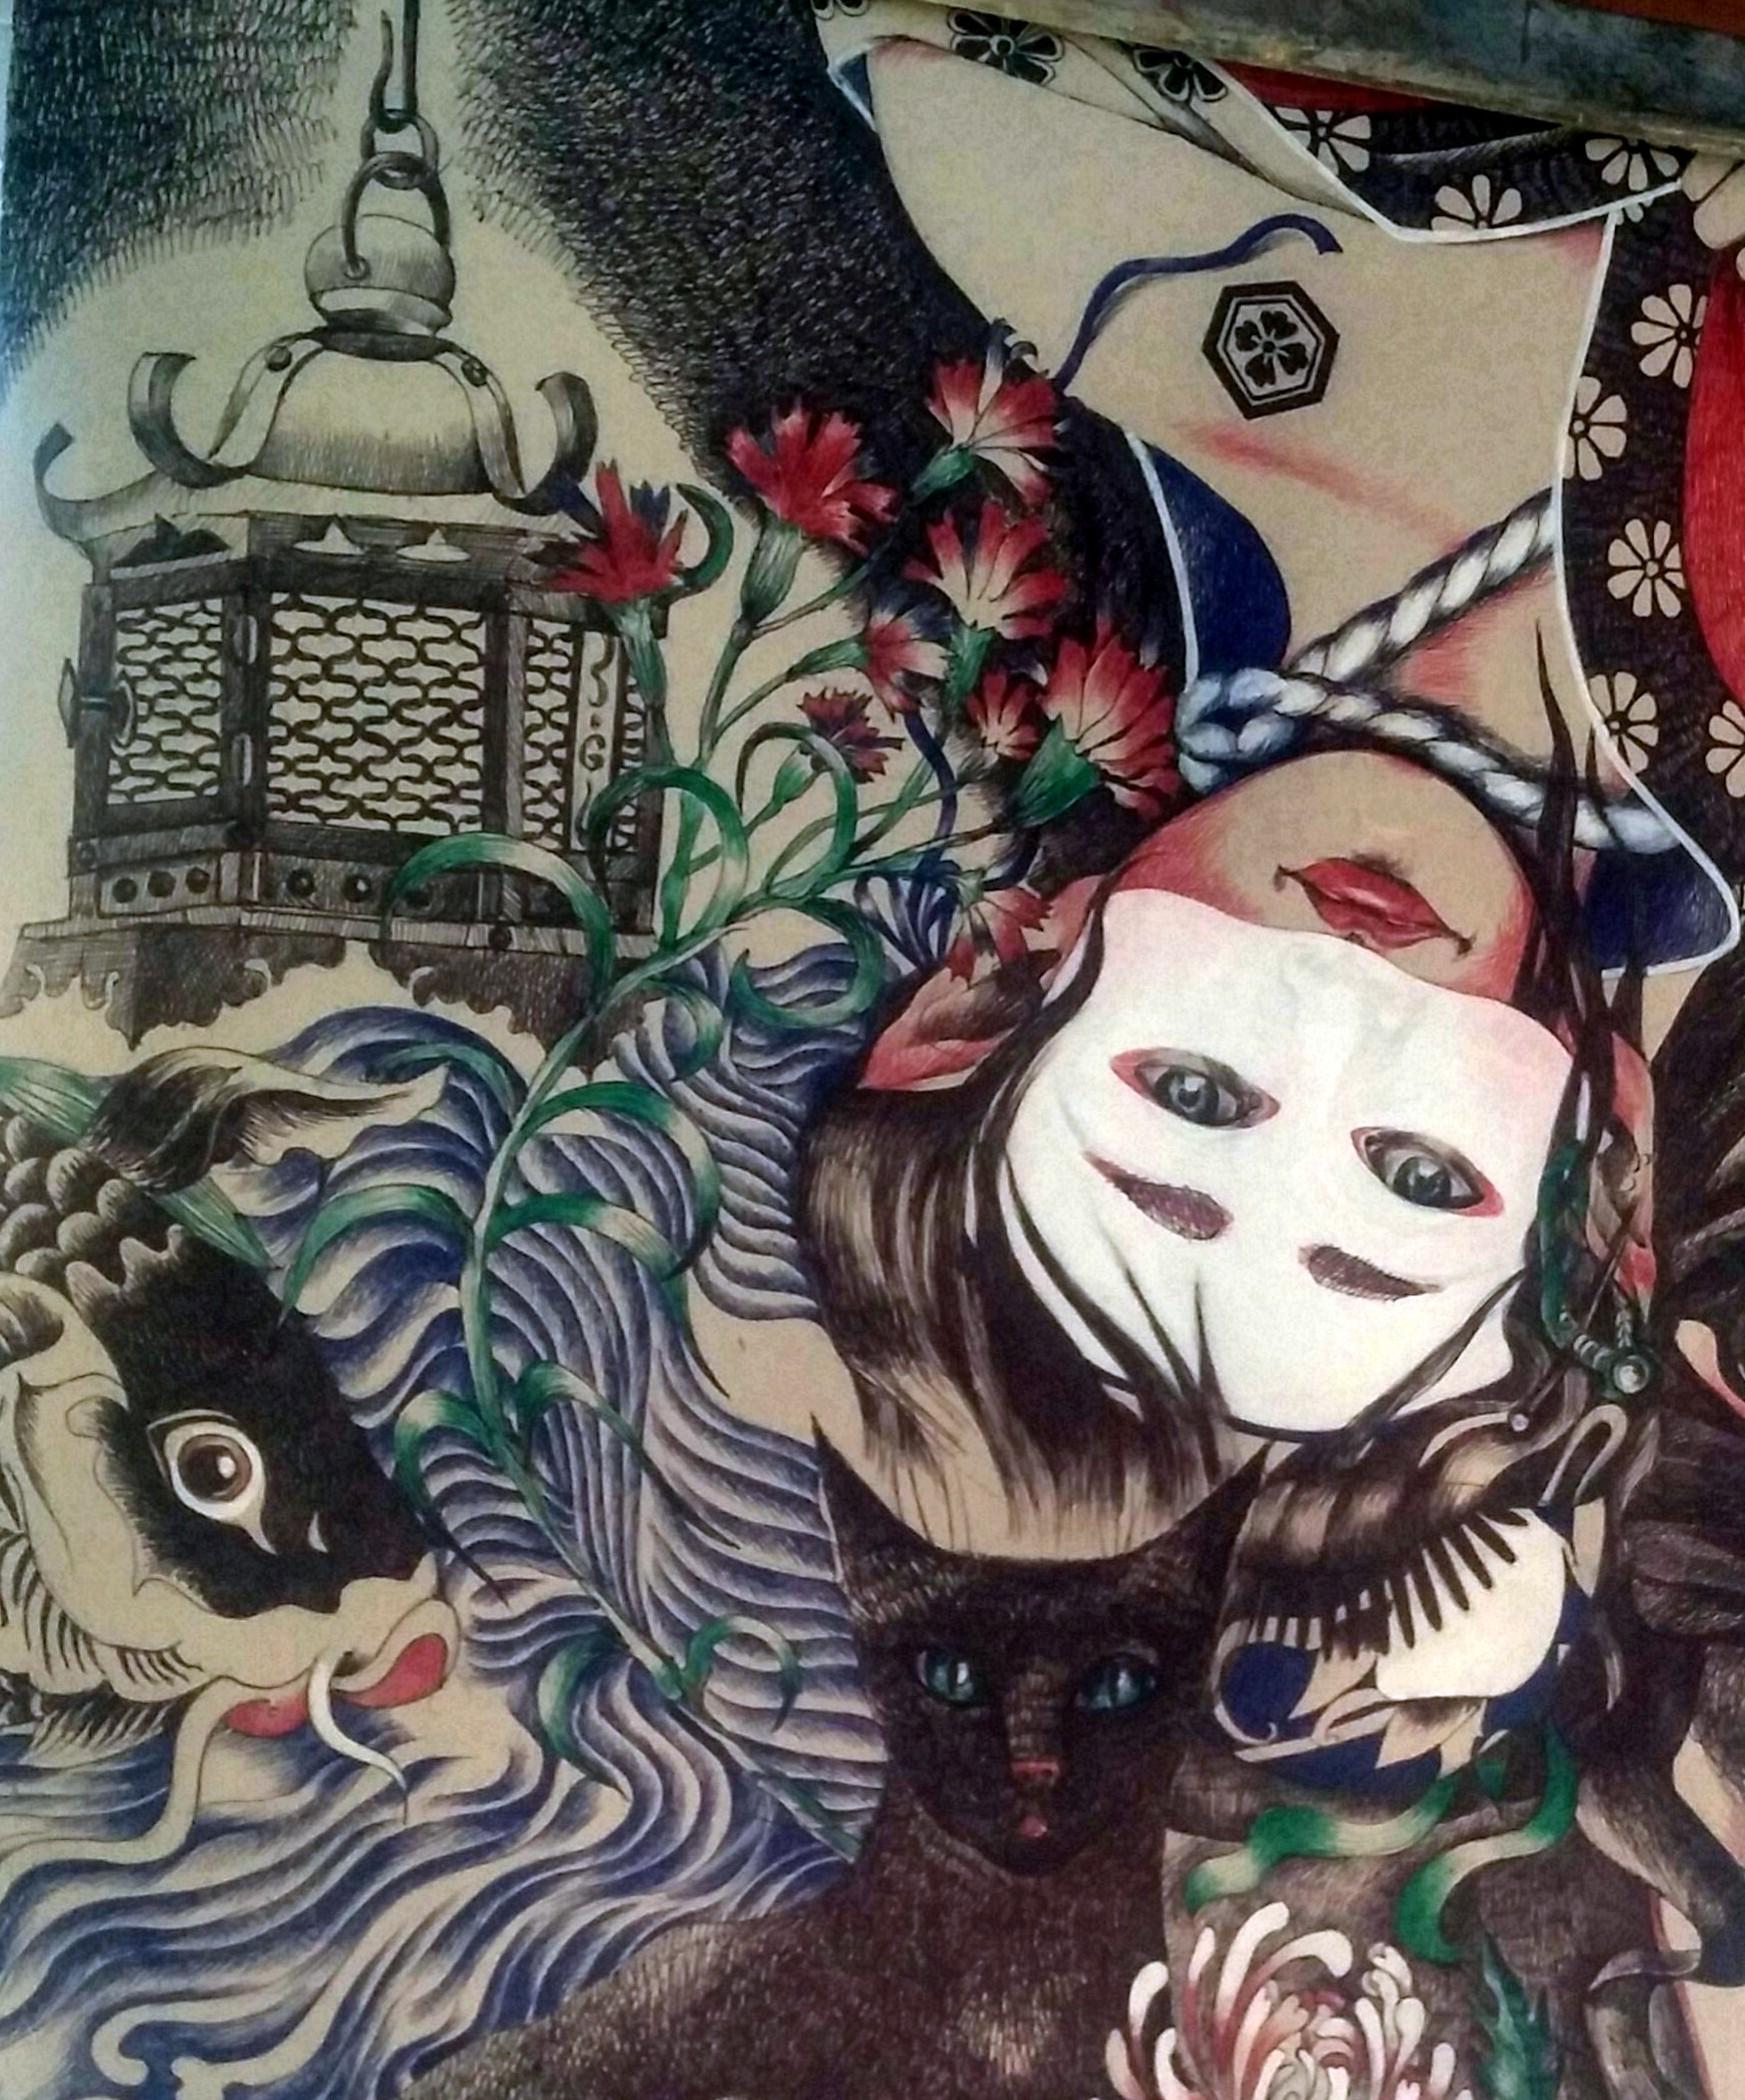 Gala Laskova présente ses dessins